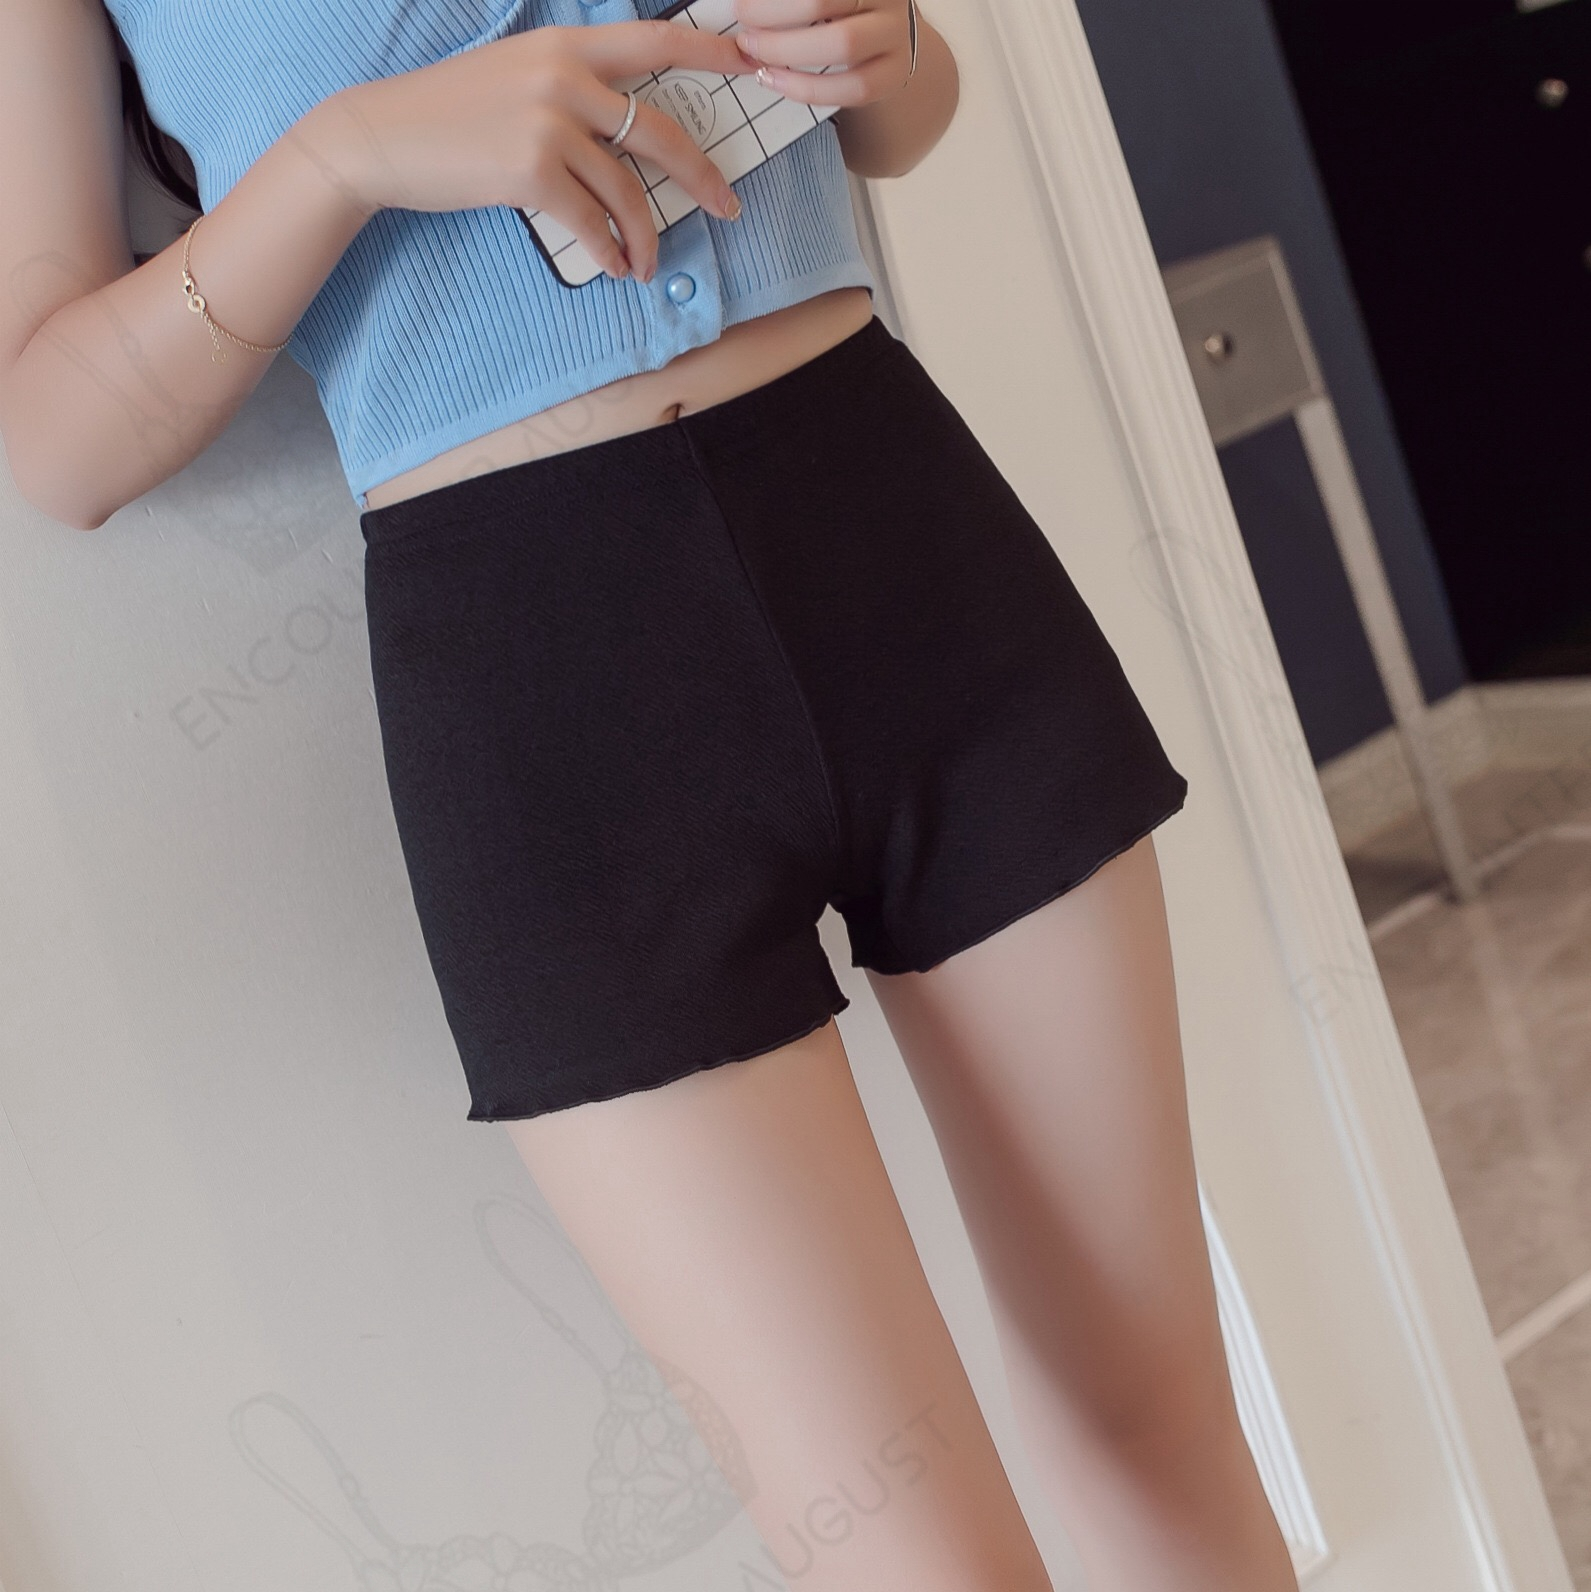 Women Safety Shorts Pants Leggings Seamless High Waist Slim Elastic Underwear